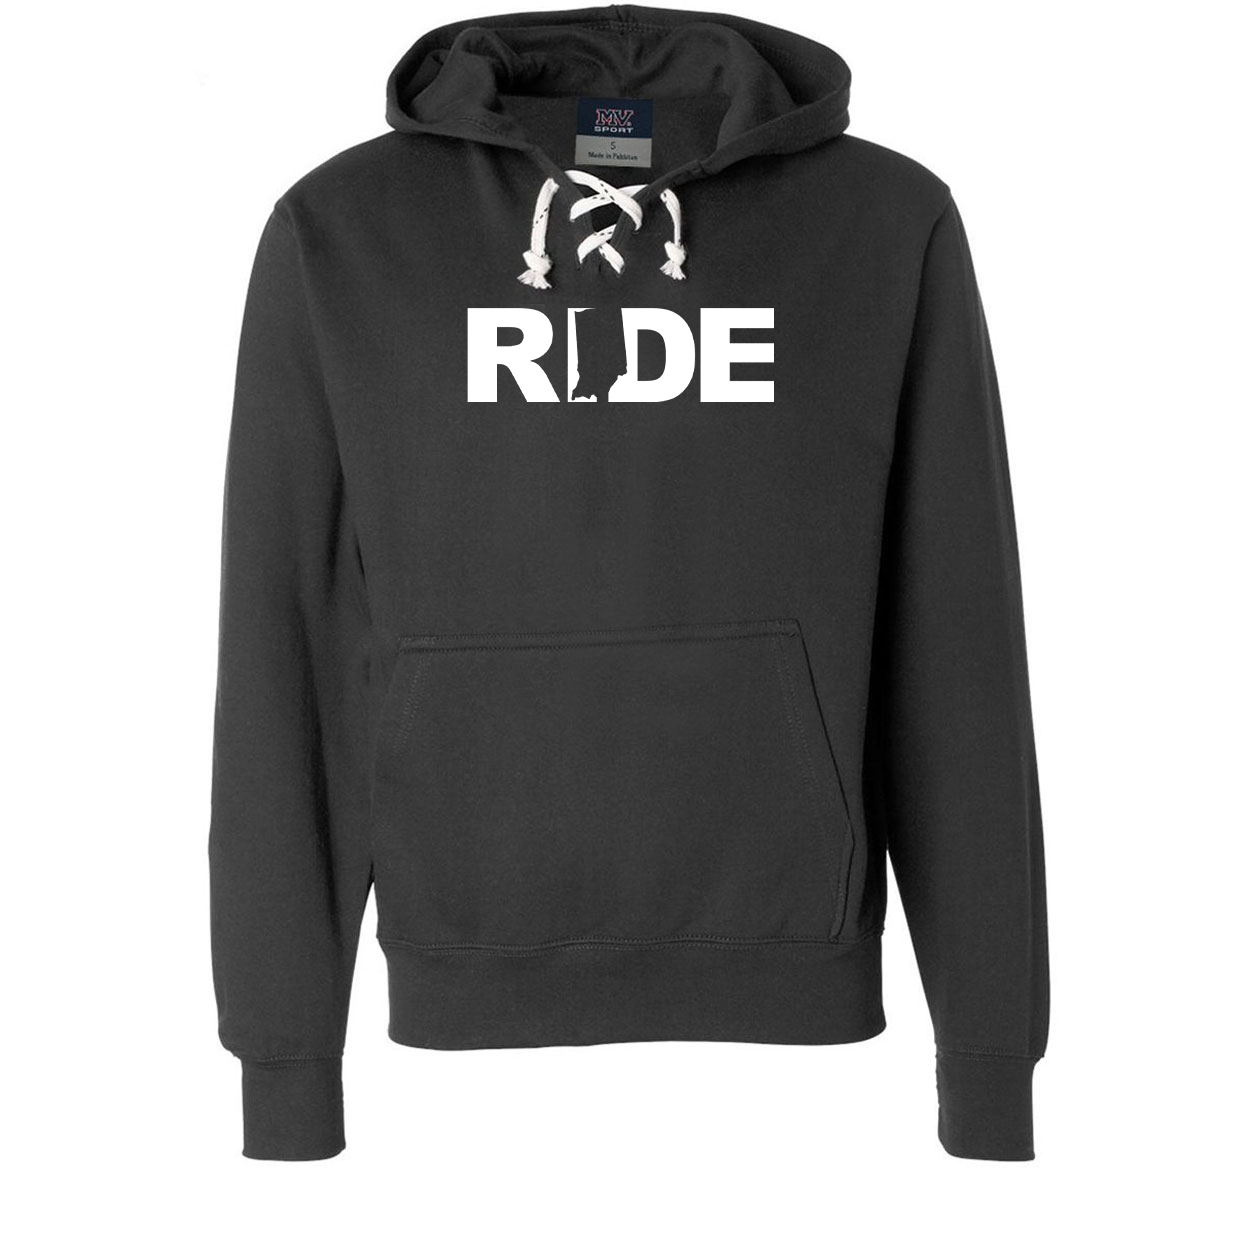 Ride Indiana Classic Unisex Premium Hockey Sweatshirt Black (White Logo)